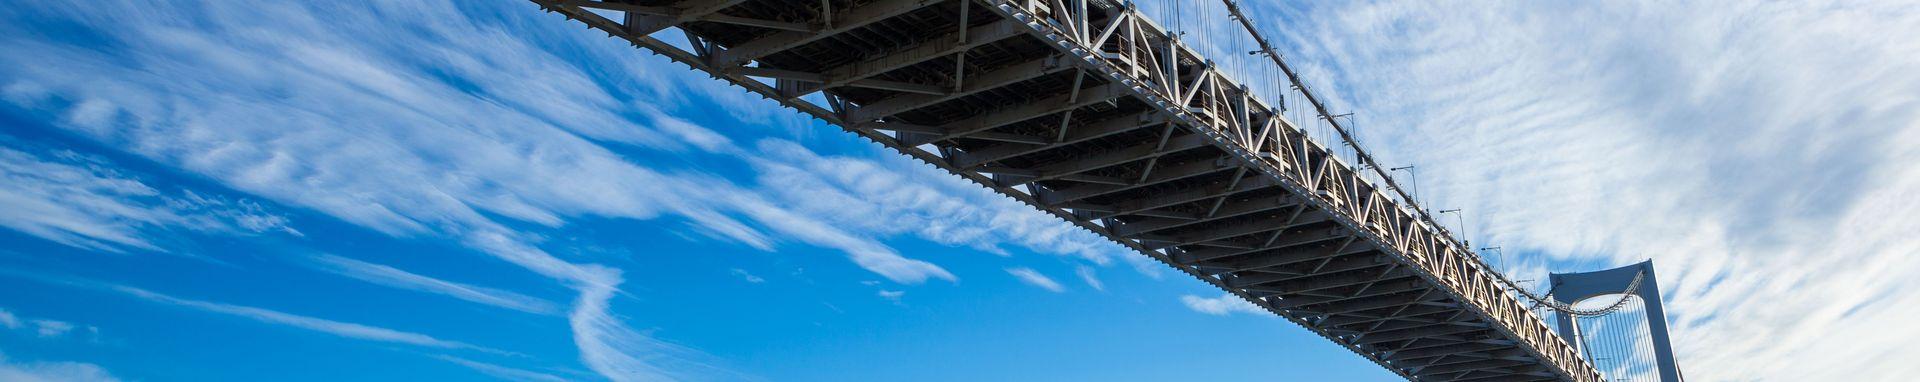 [Translate to Japanisch:] vibration large bridge